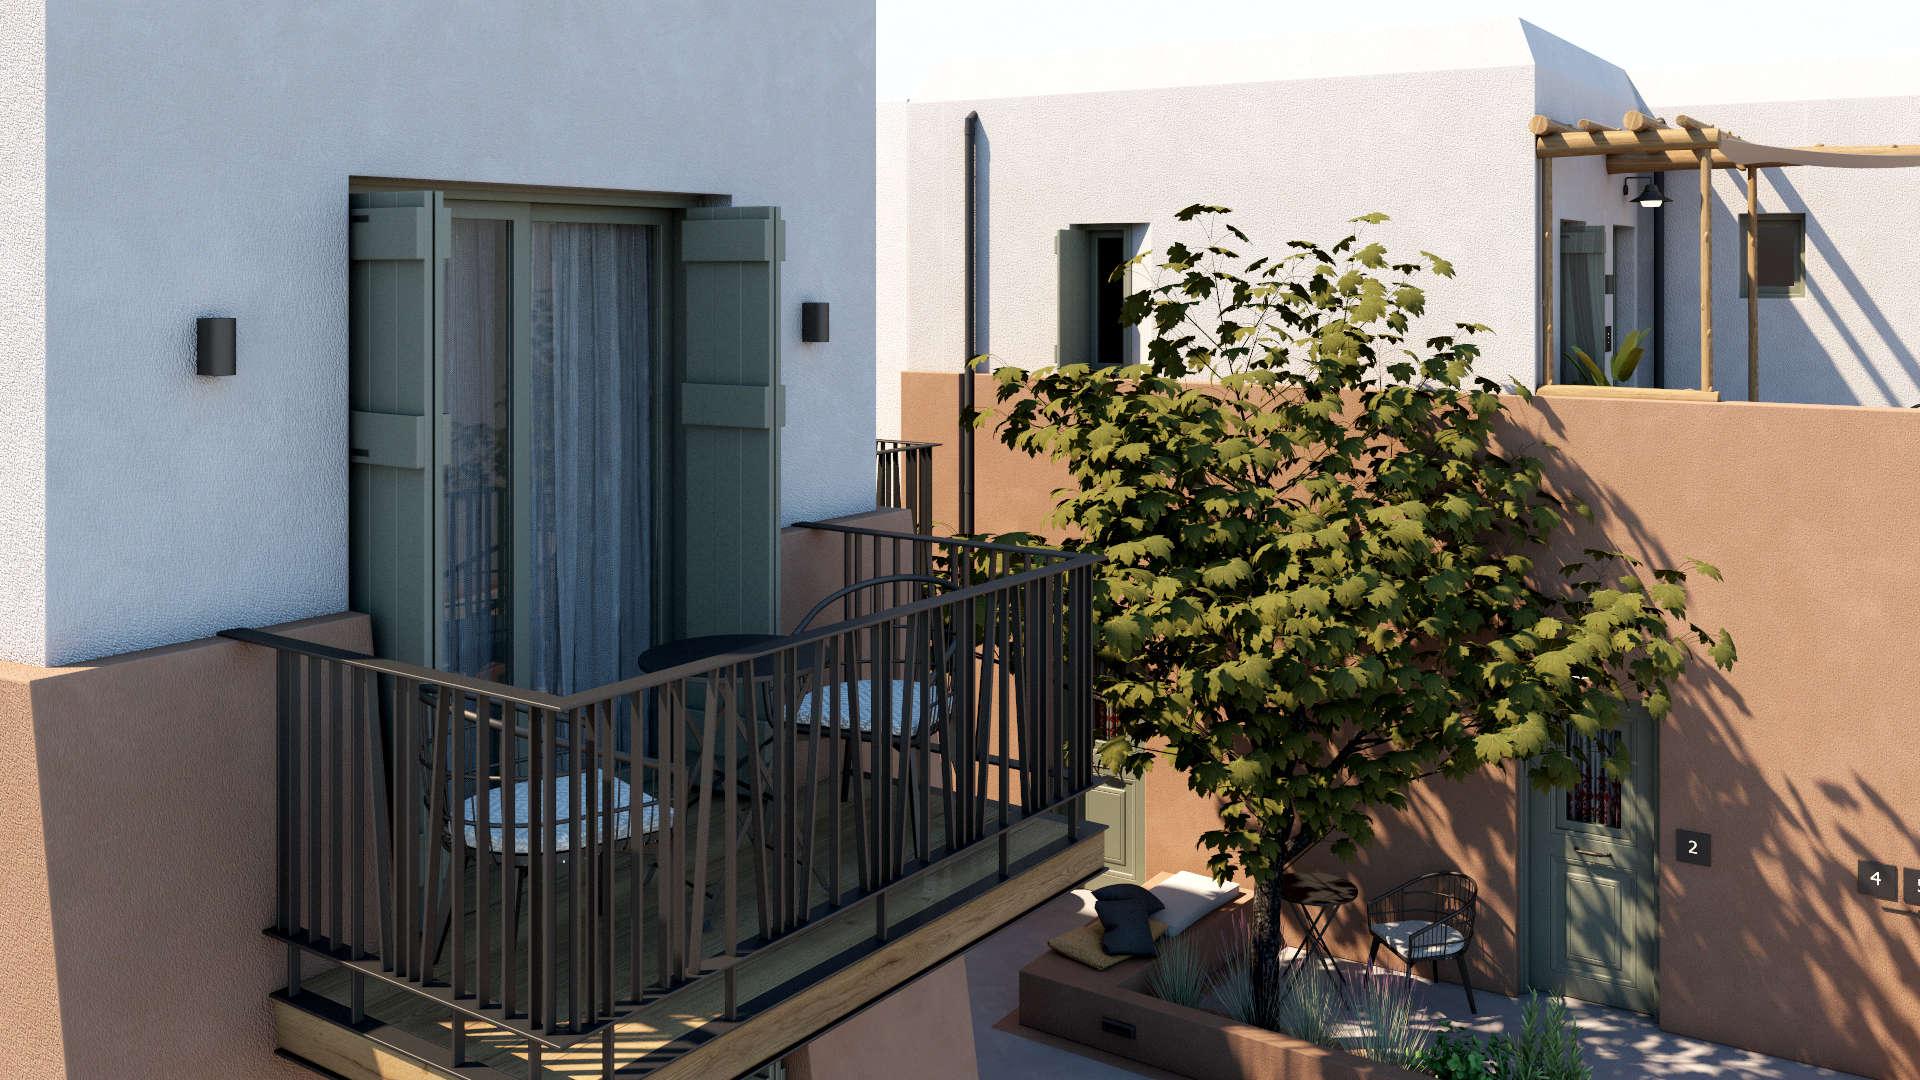 Hotel in a village, exterior design, sitting area, balcony, facade. Τουριστικό κατάλυμα σε οικισμό, εξωτερικές διαμορφώσεις, καθιστικό, όψη, μπαλκόνι.